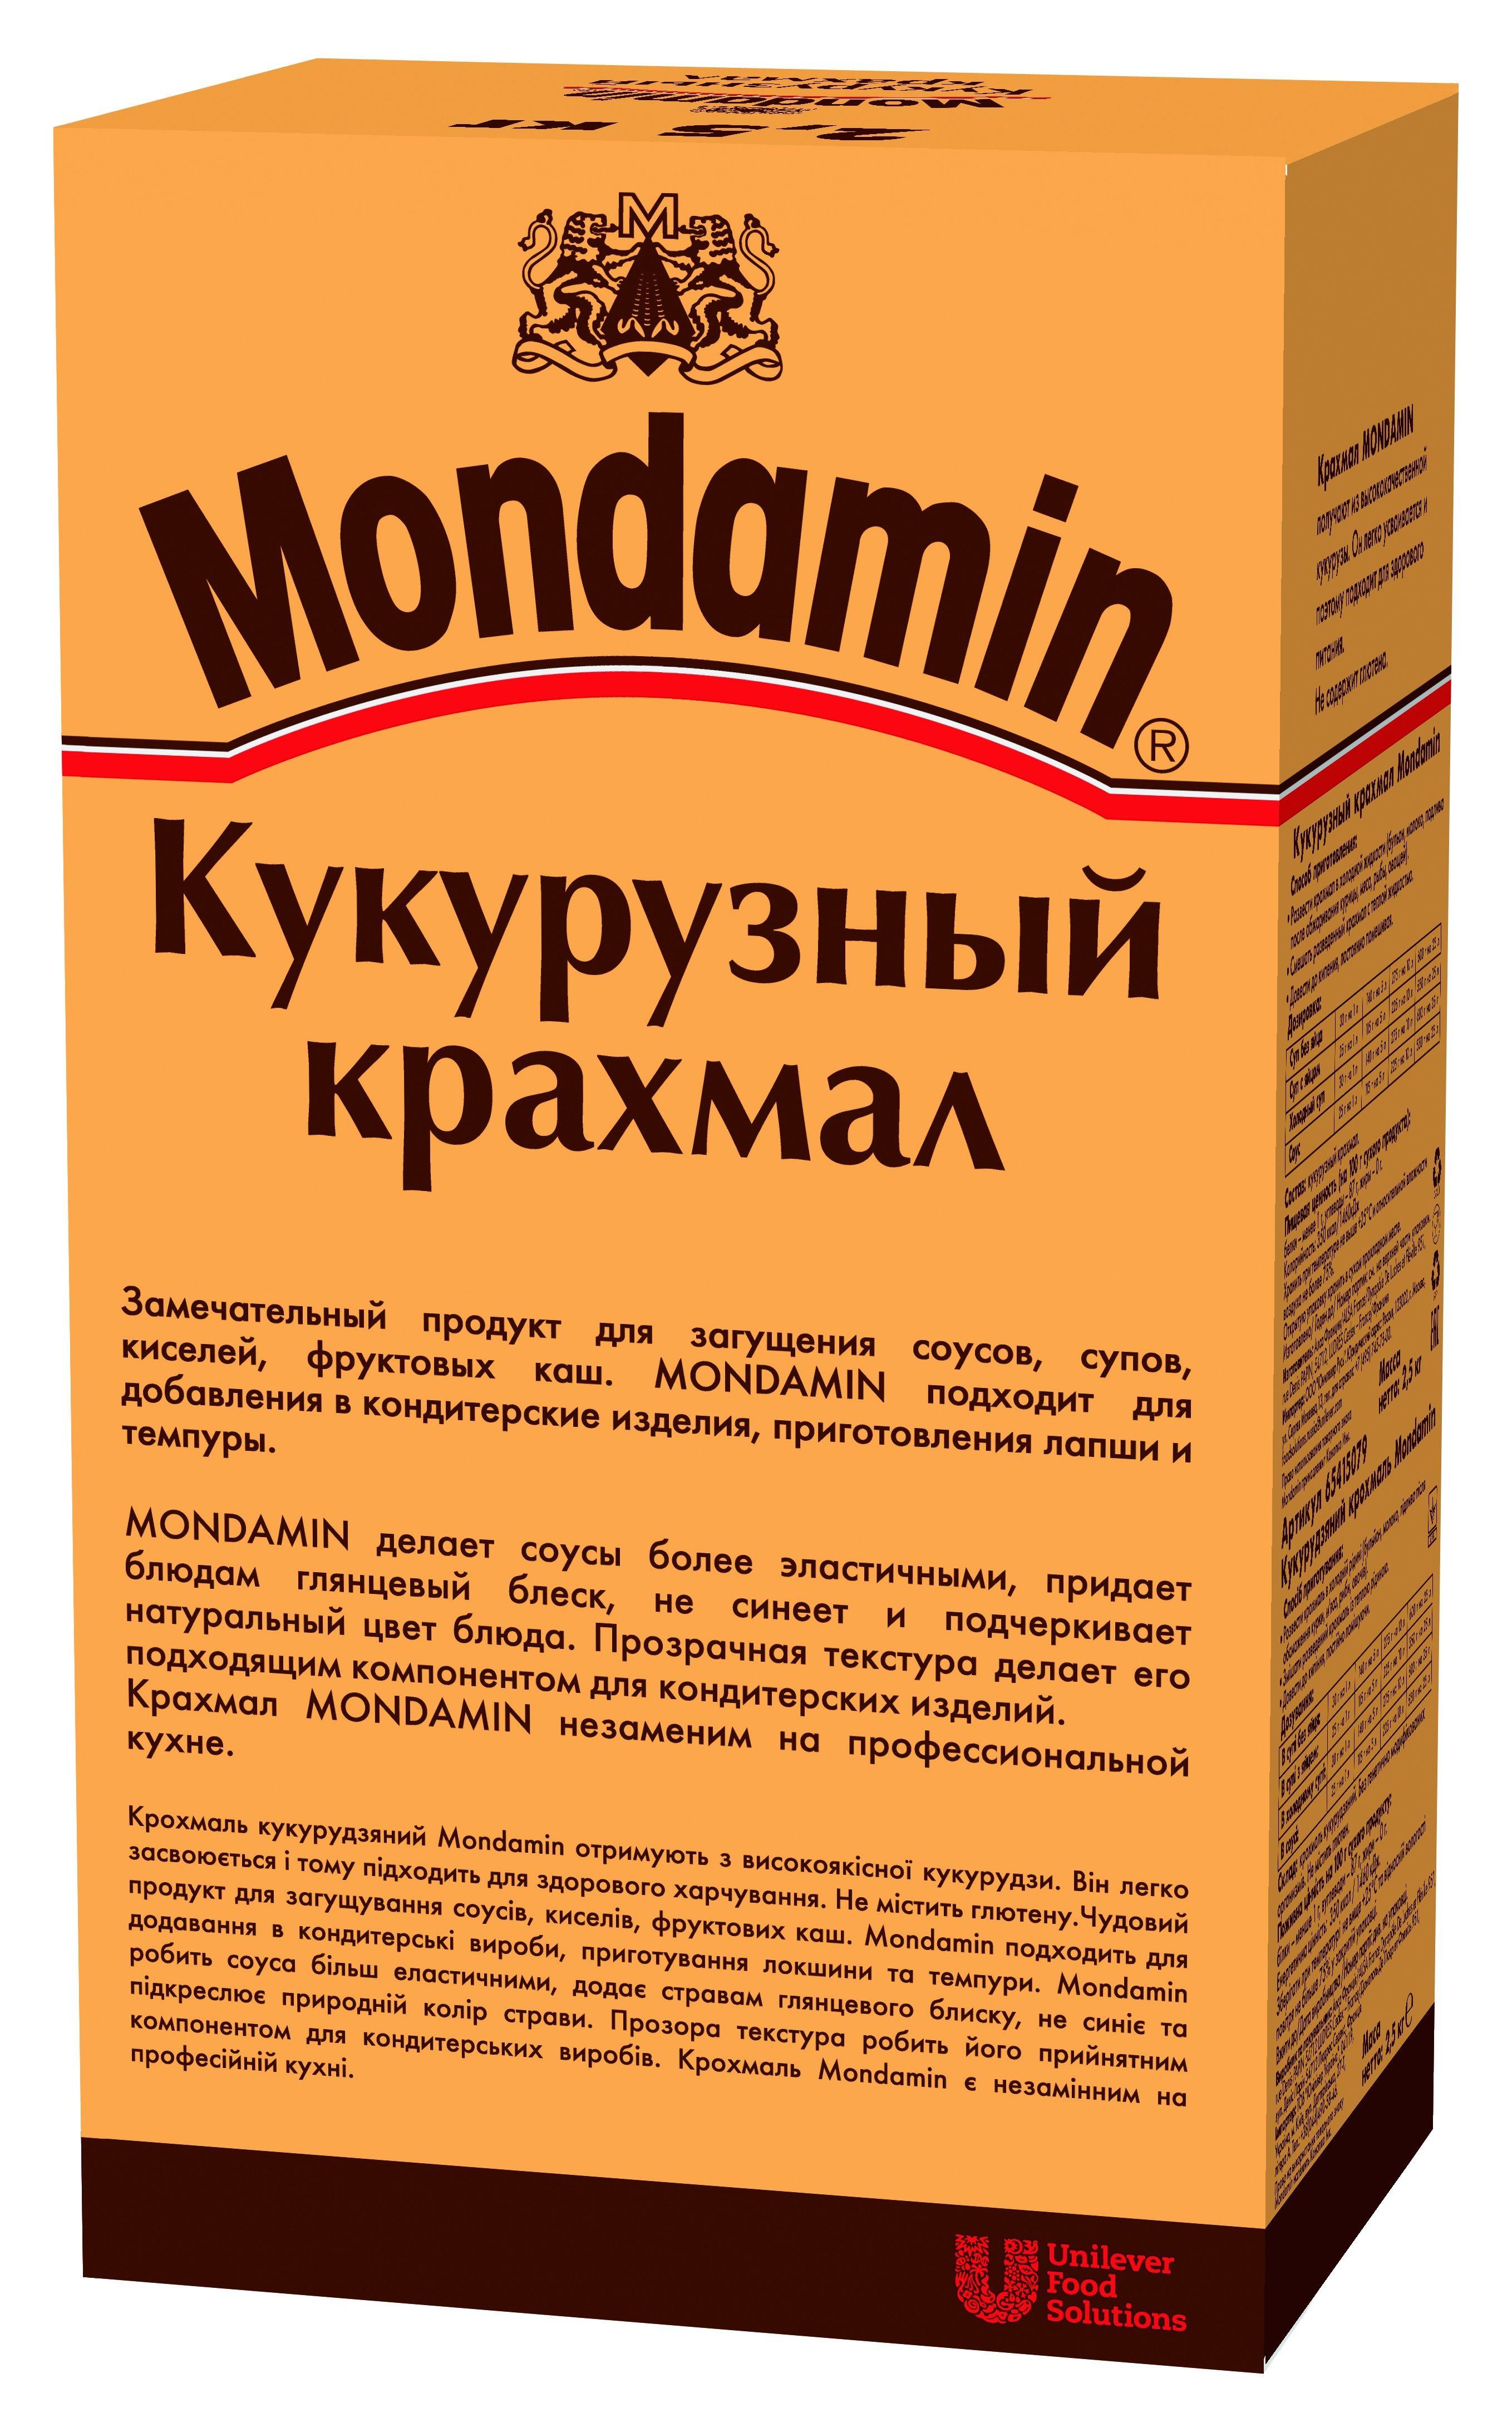 Кукурузный крахмал Мондамин